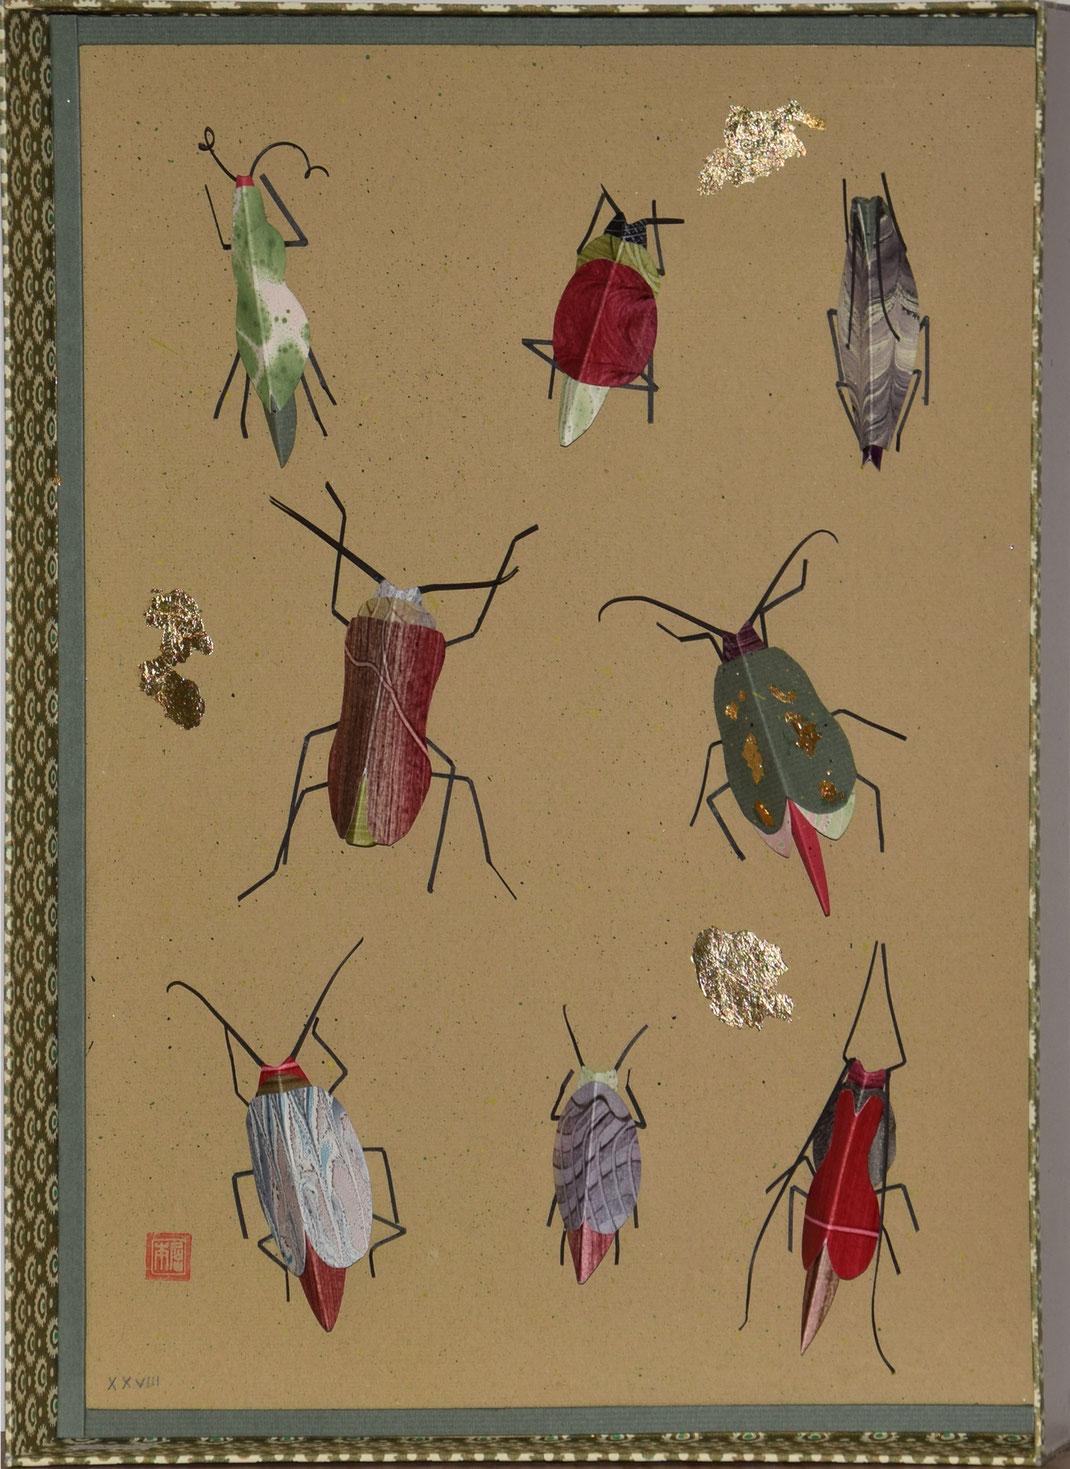 Papierrichter, Papierkunst, Objekt, Kunst, Schachtel, Buchbinder, Kleisterpapier, Buntpapier, Dobis, Andreas Richter